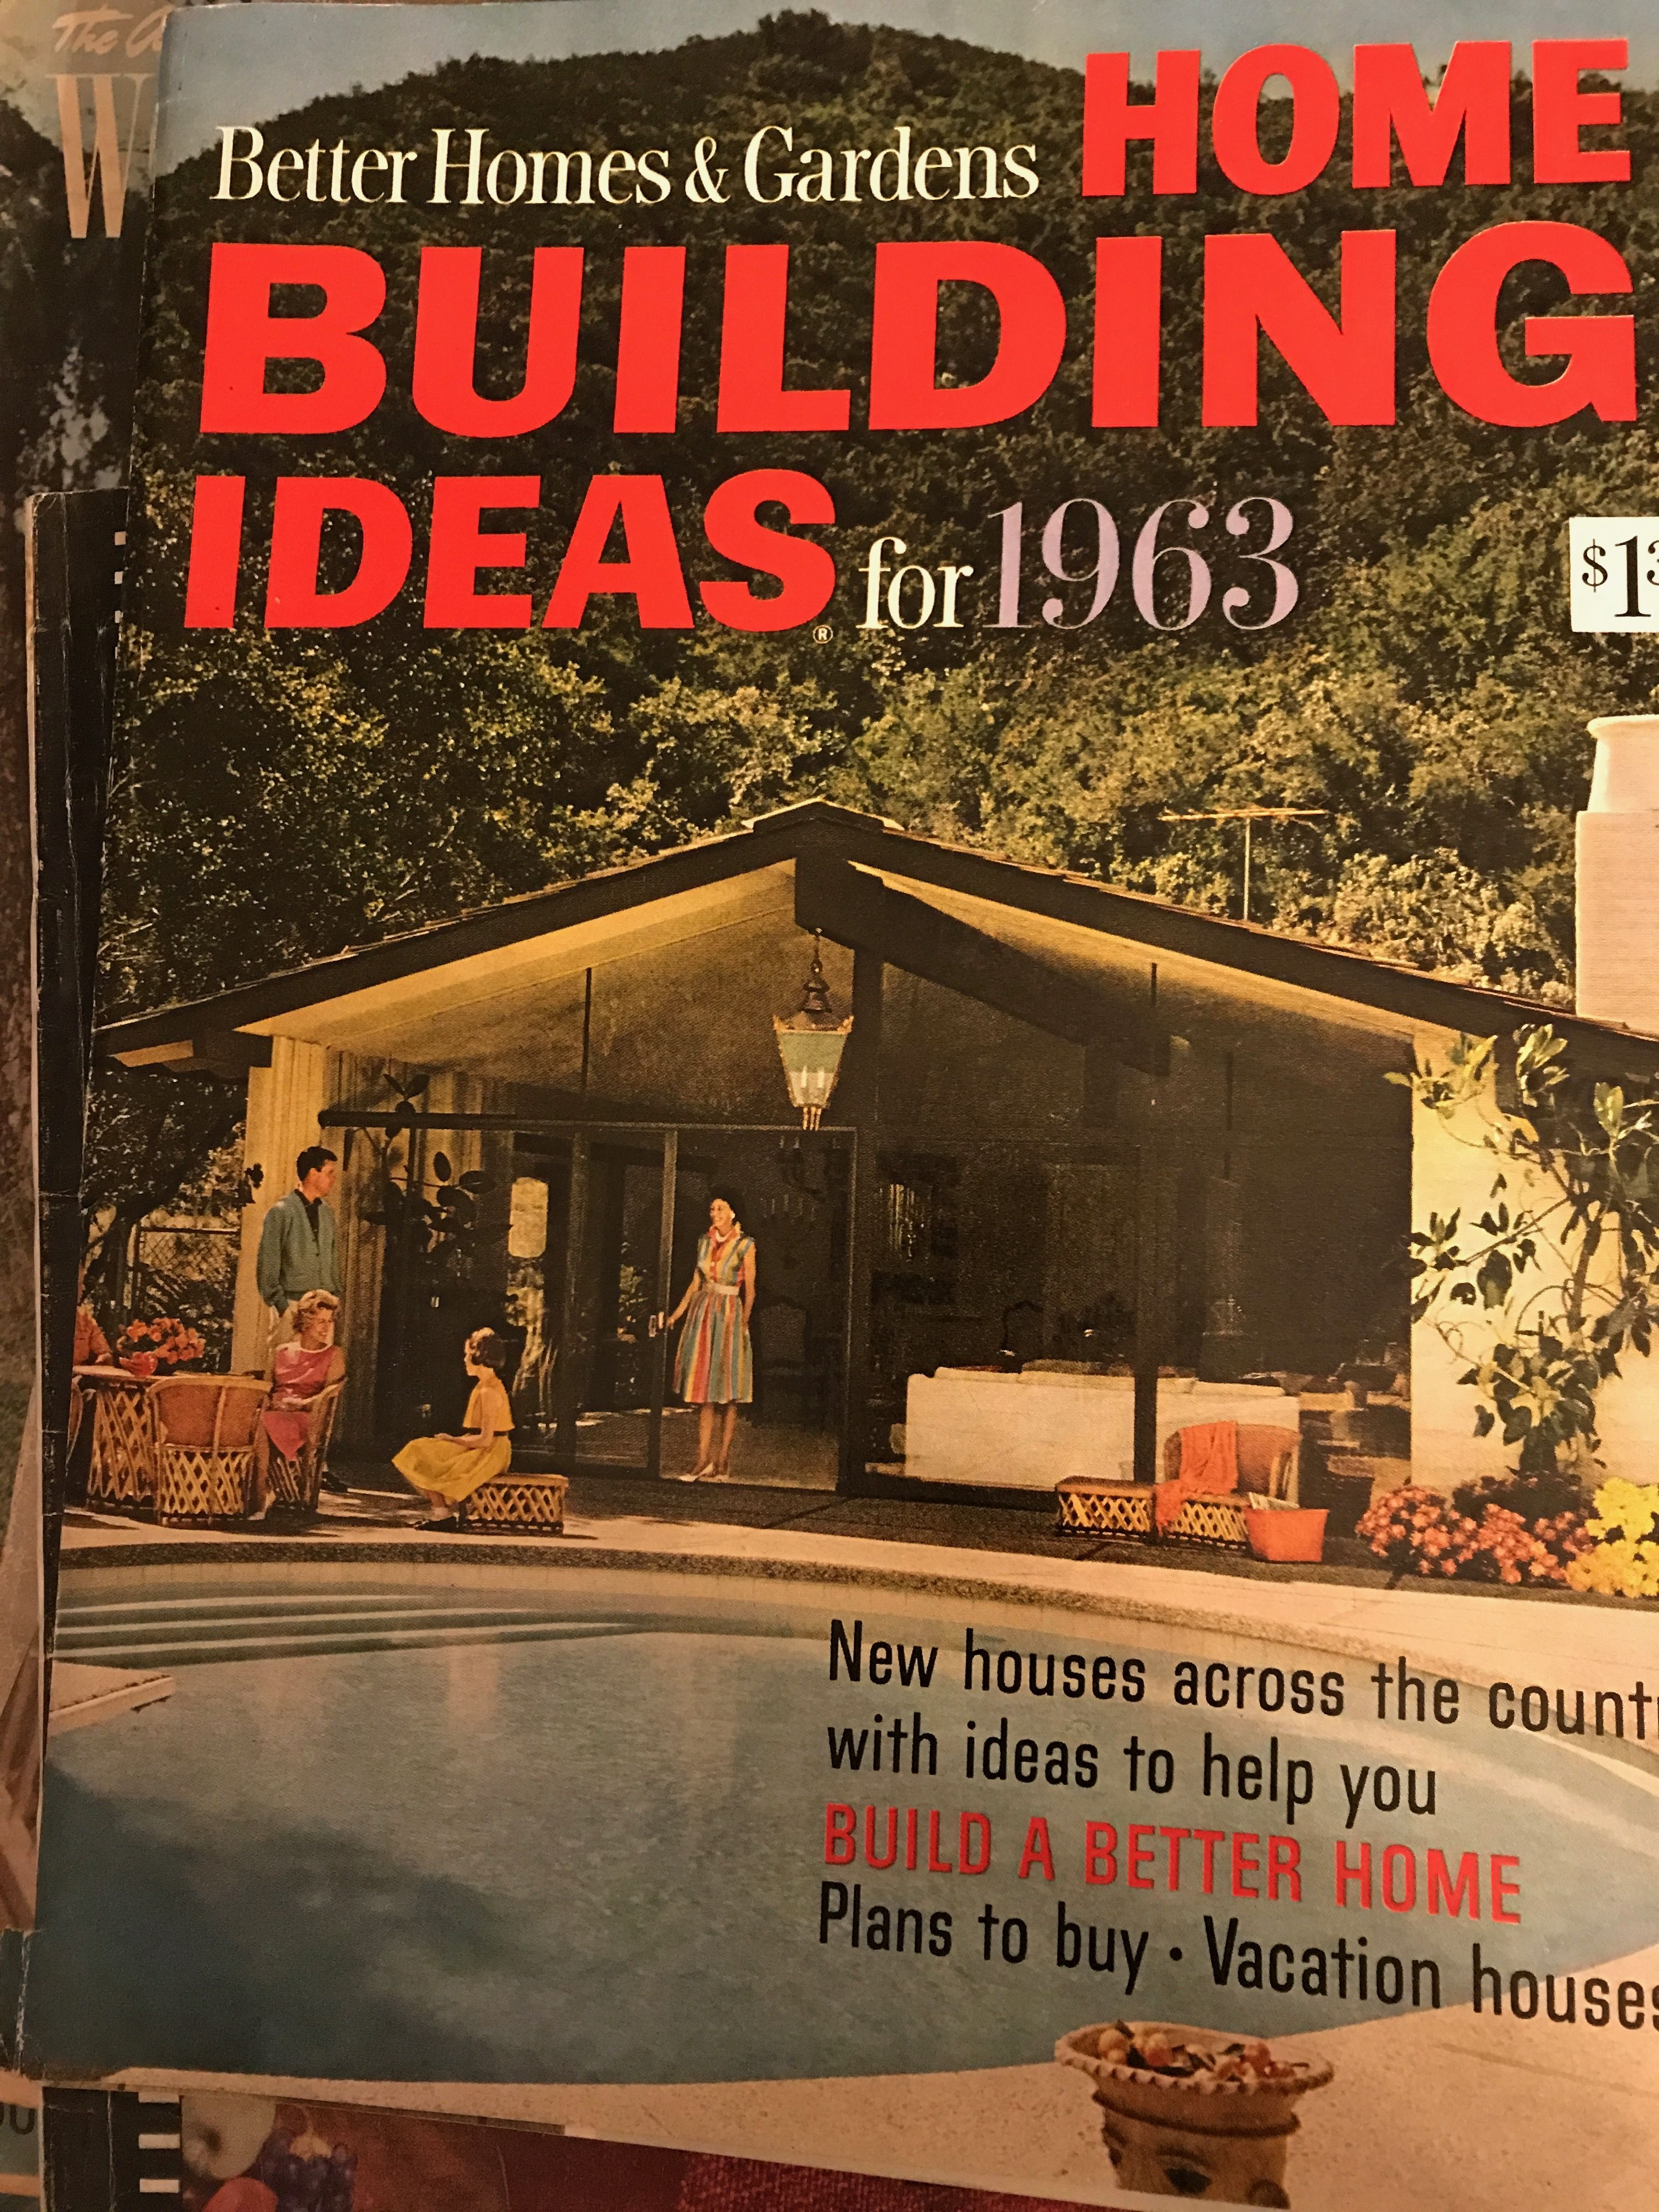 Better Homes & Gardens: Home Building Ideas for 1963 ...